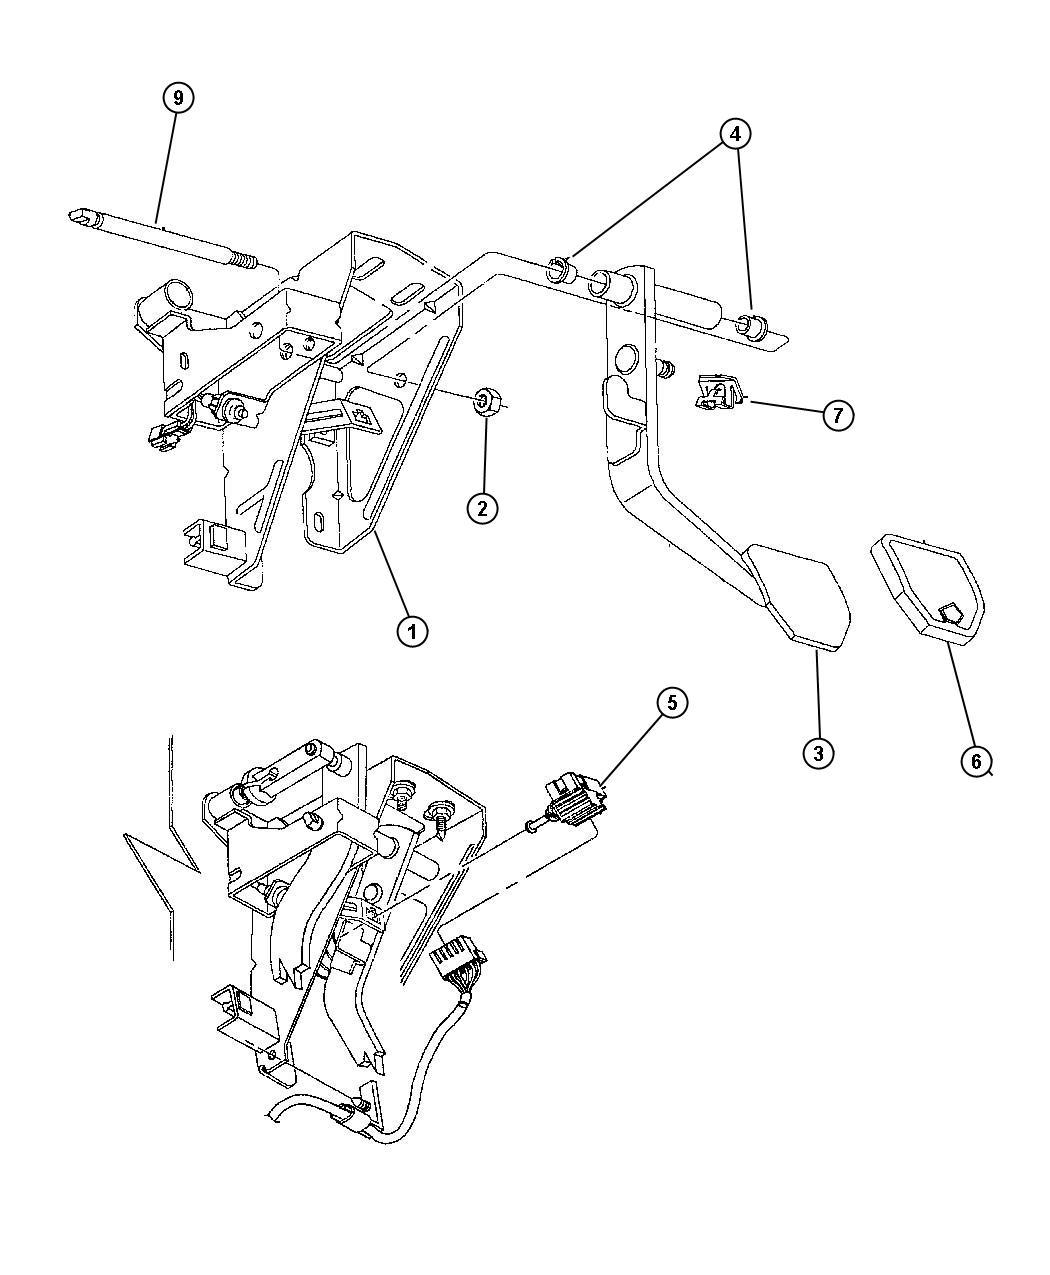 1998 Dodge Neon Pedal, Brake